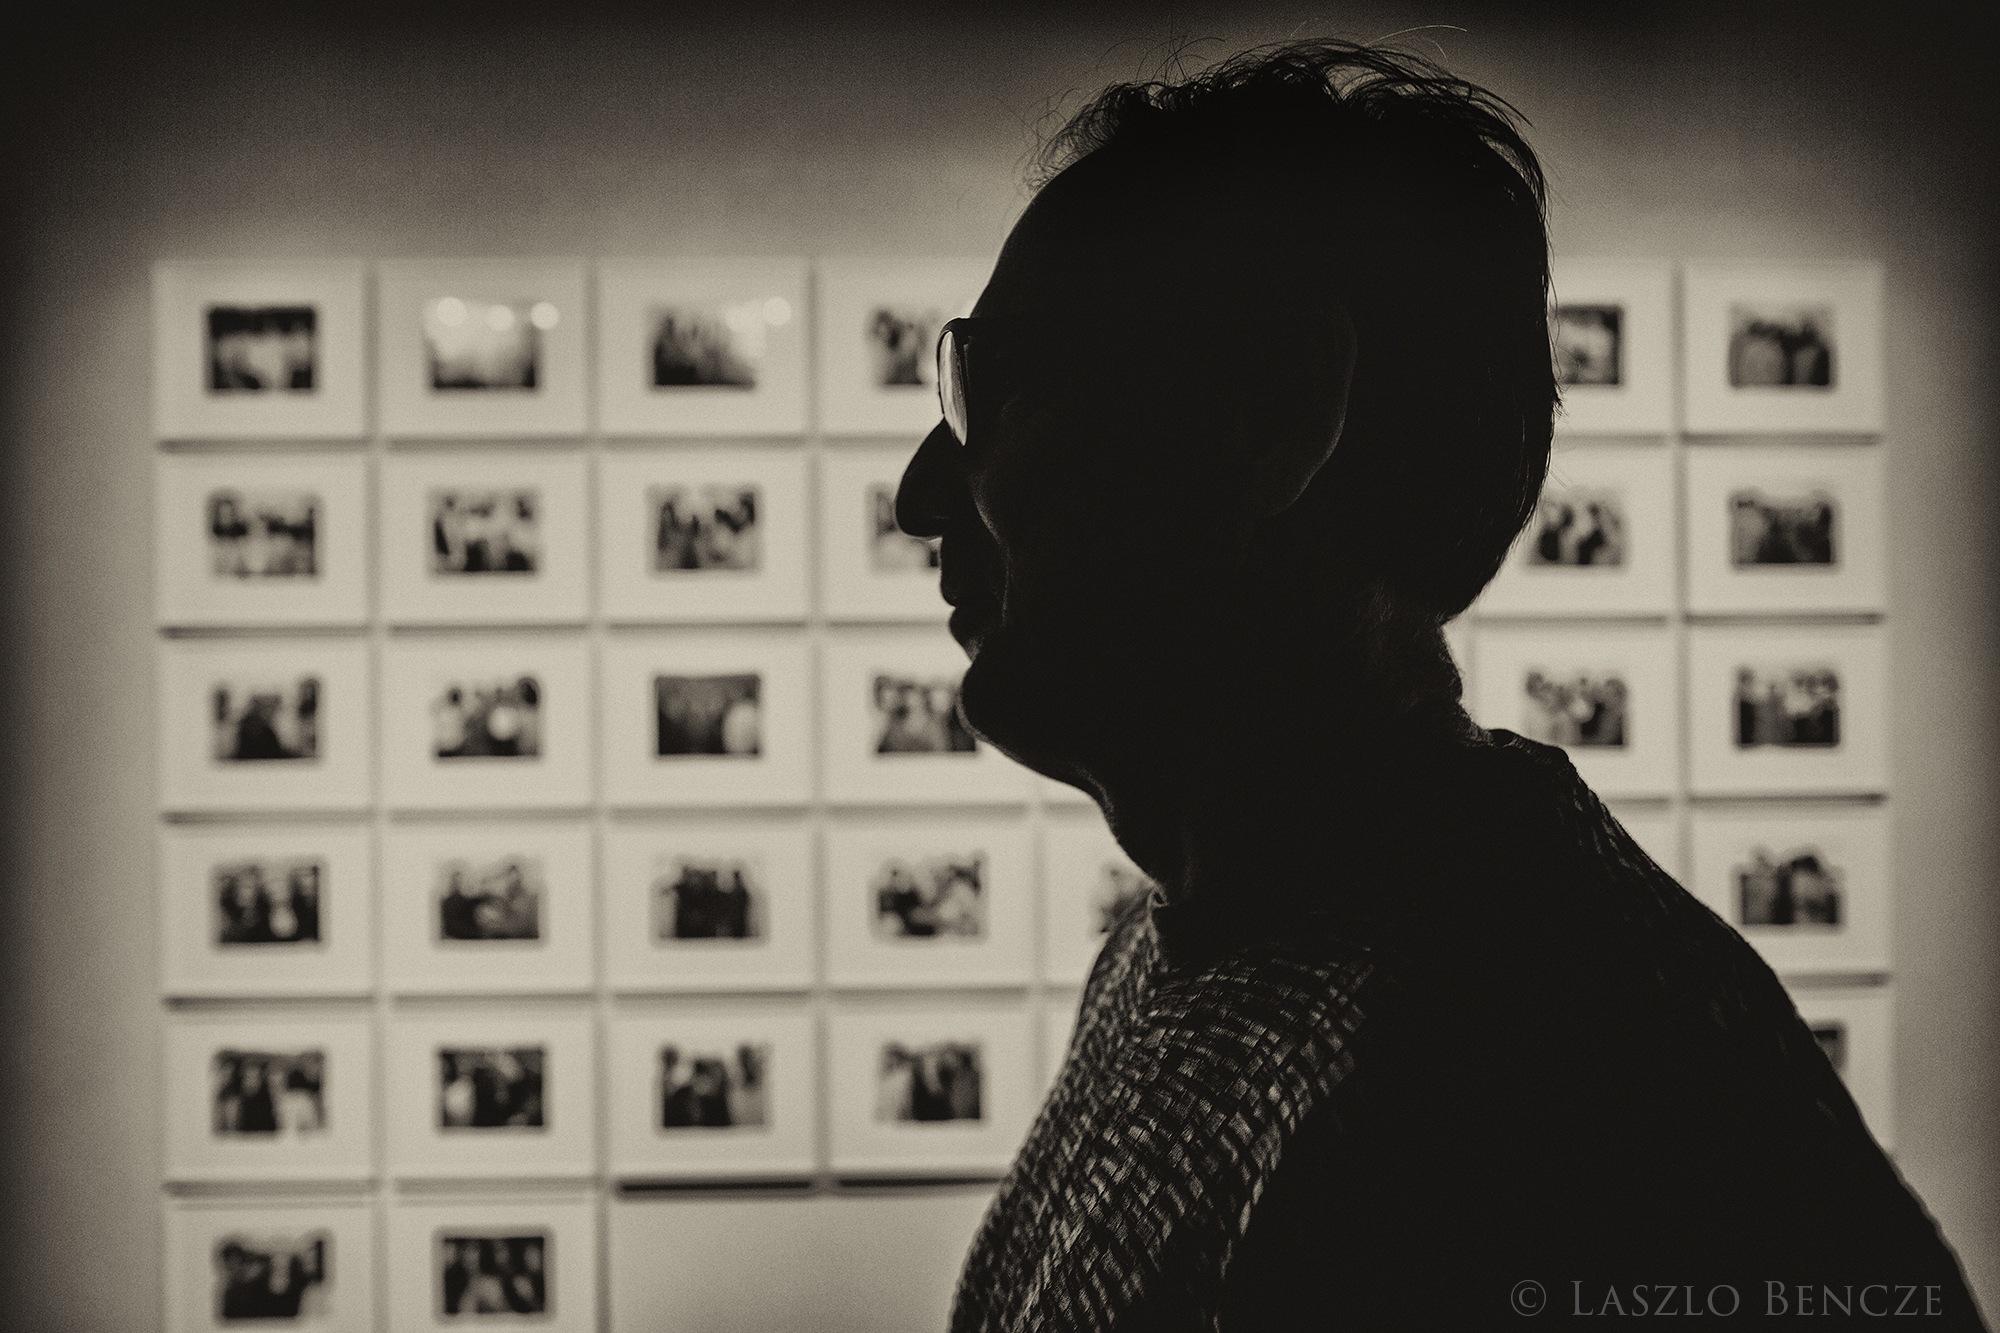 David in Pier 21 Museum by Laszlo Bencze